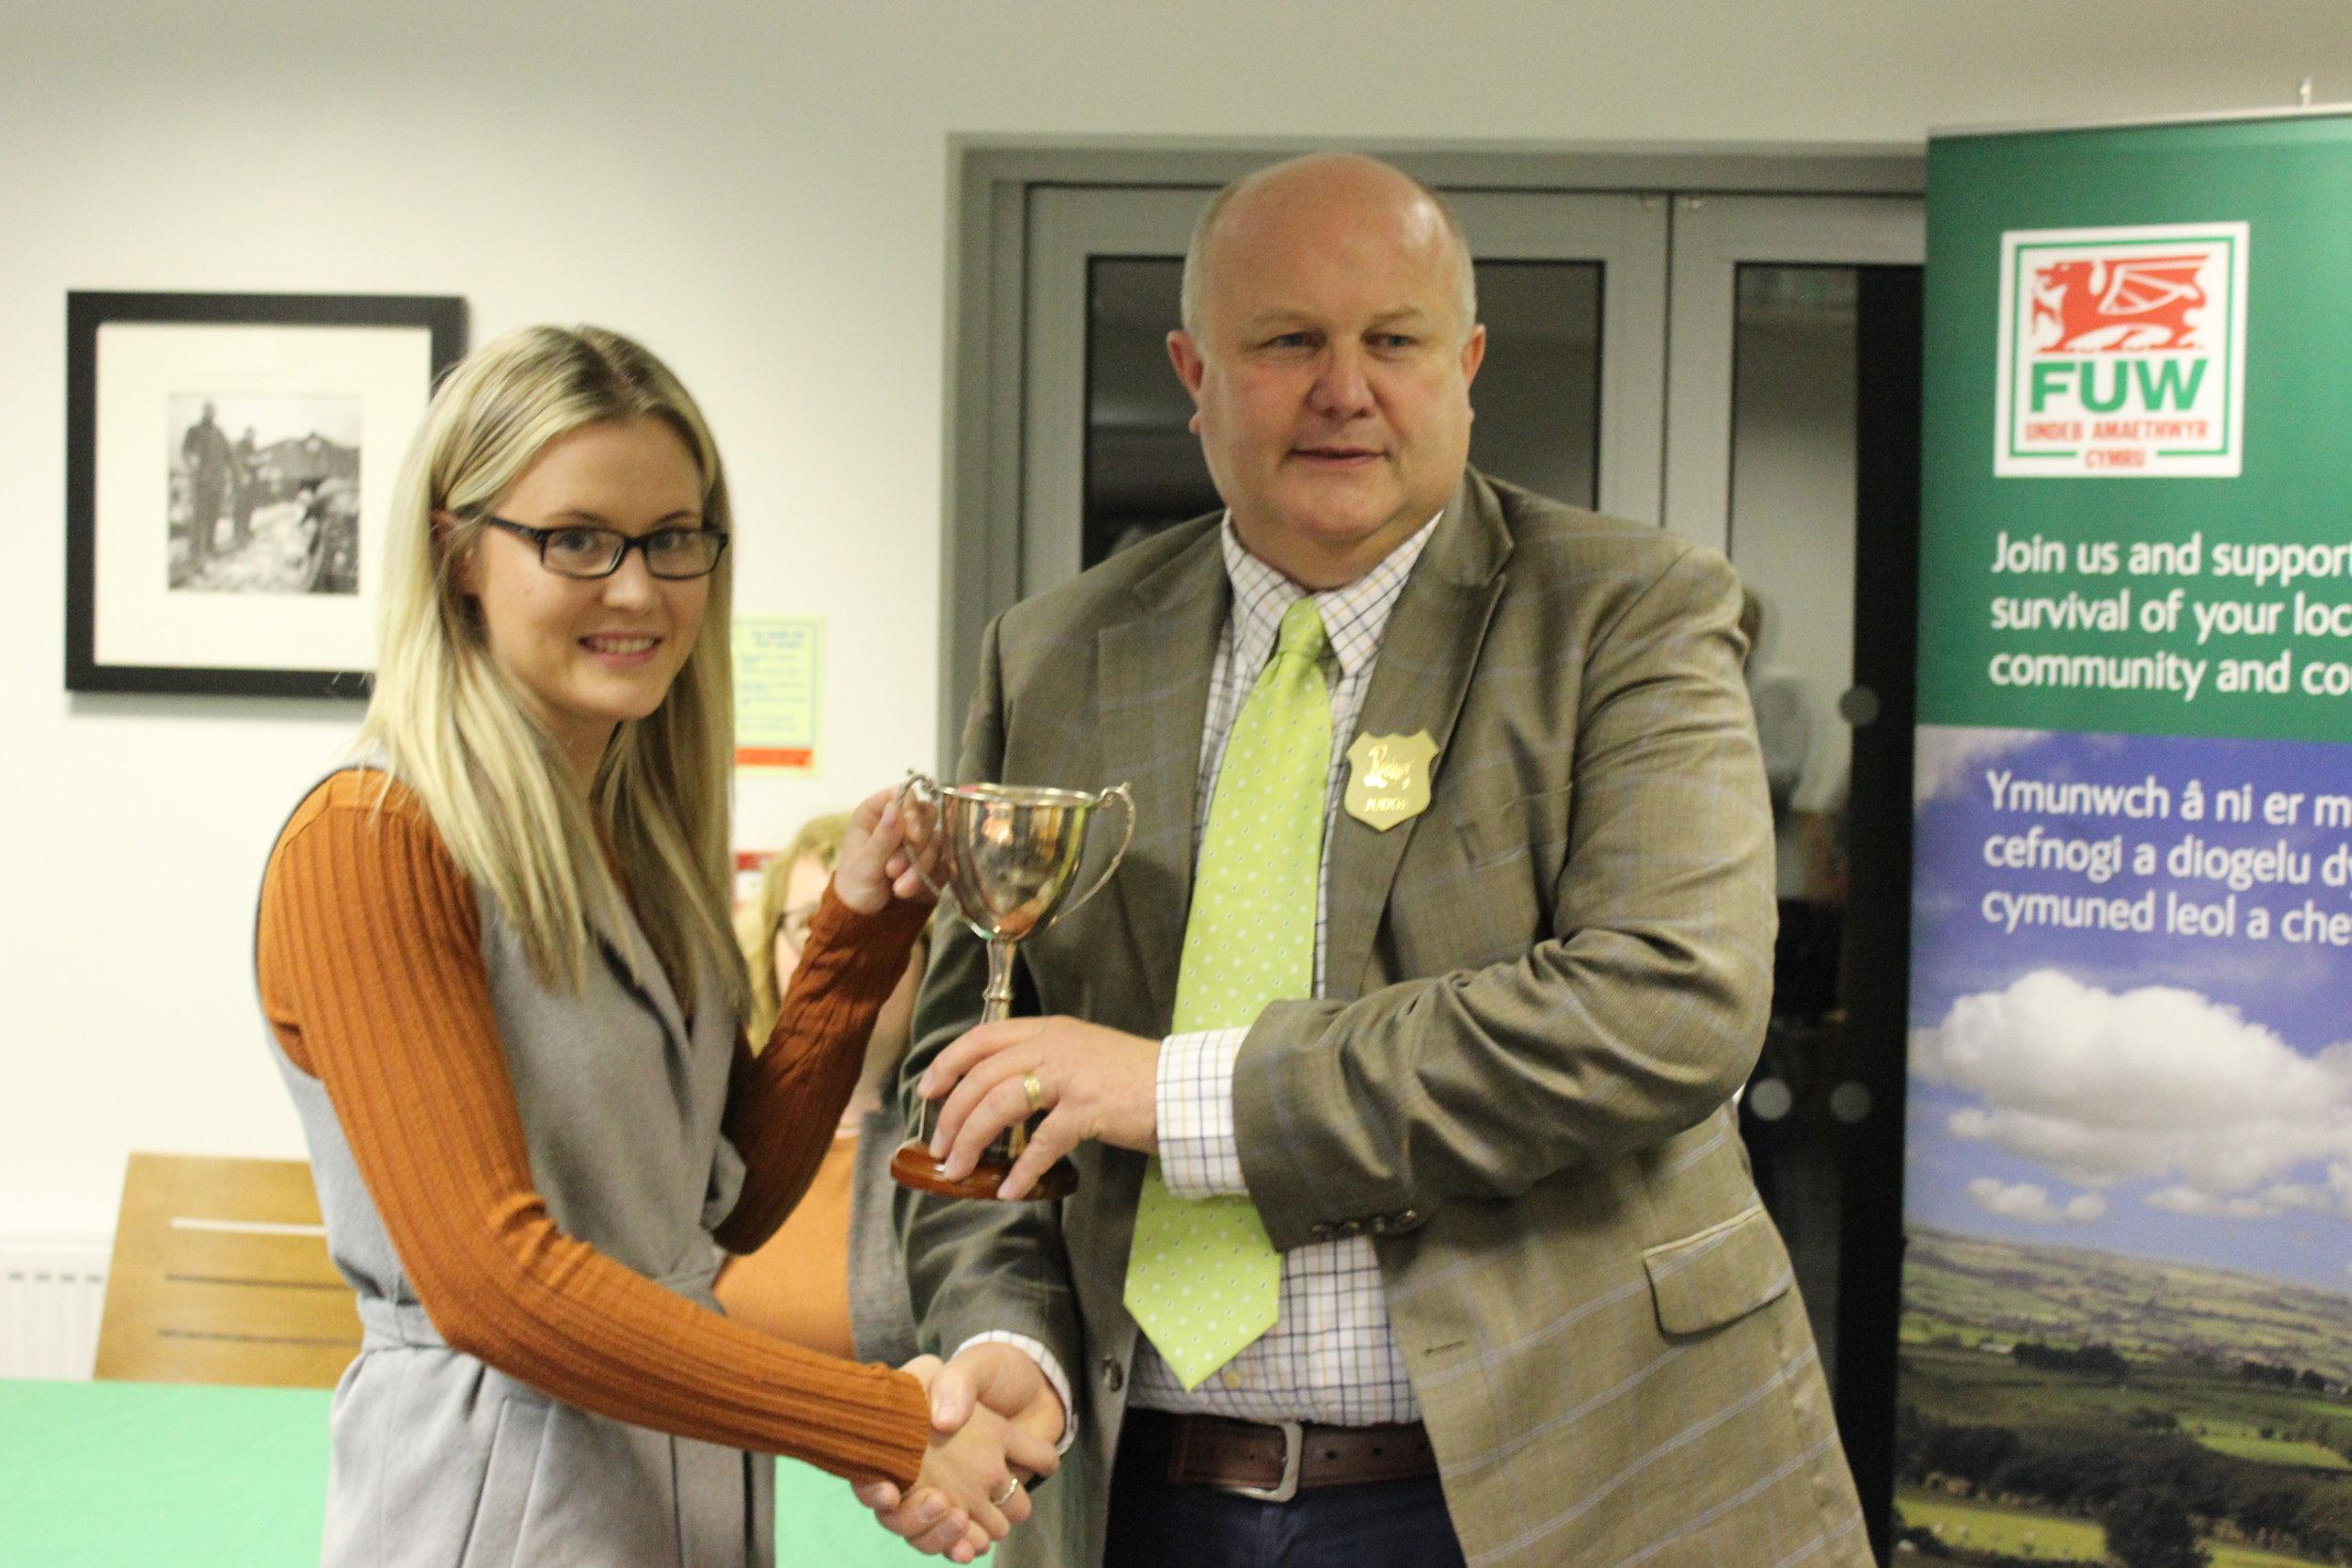 Laura Watson, Llanbadarn Fynydd YFC being presented with the Owen Duggan Memorial Cup for Best Individual by Judge Stuart Anthony.